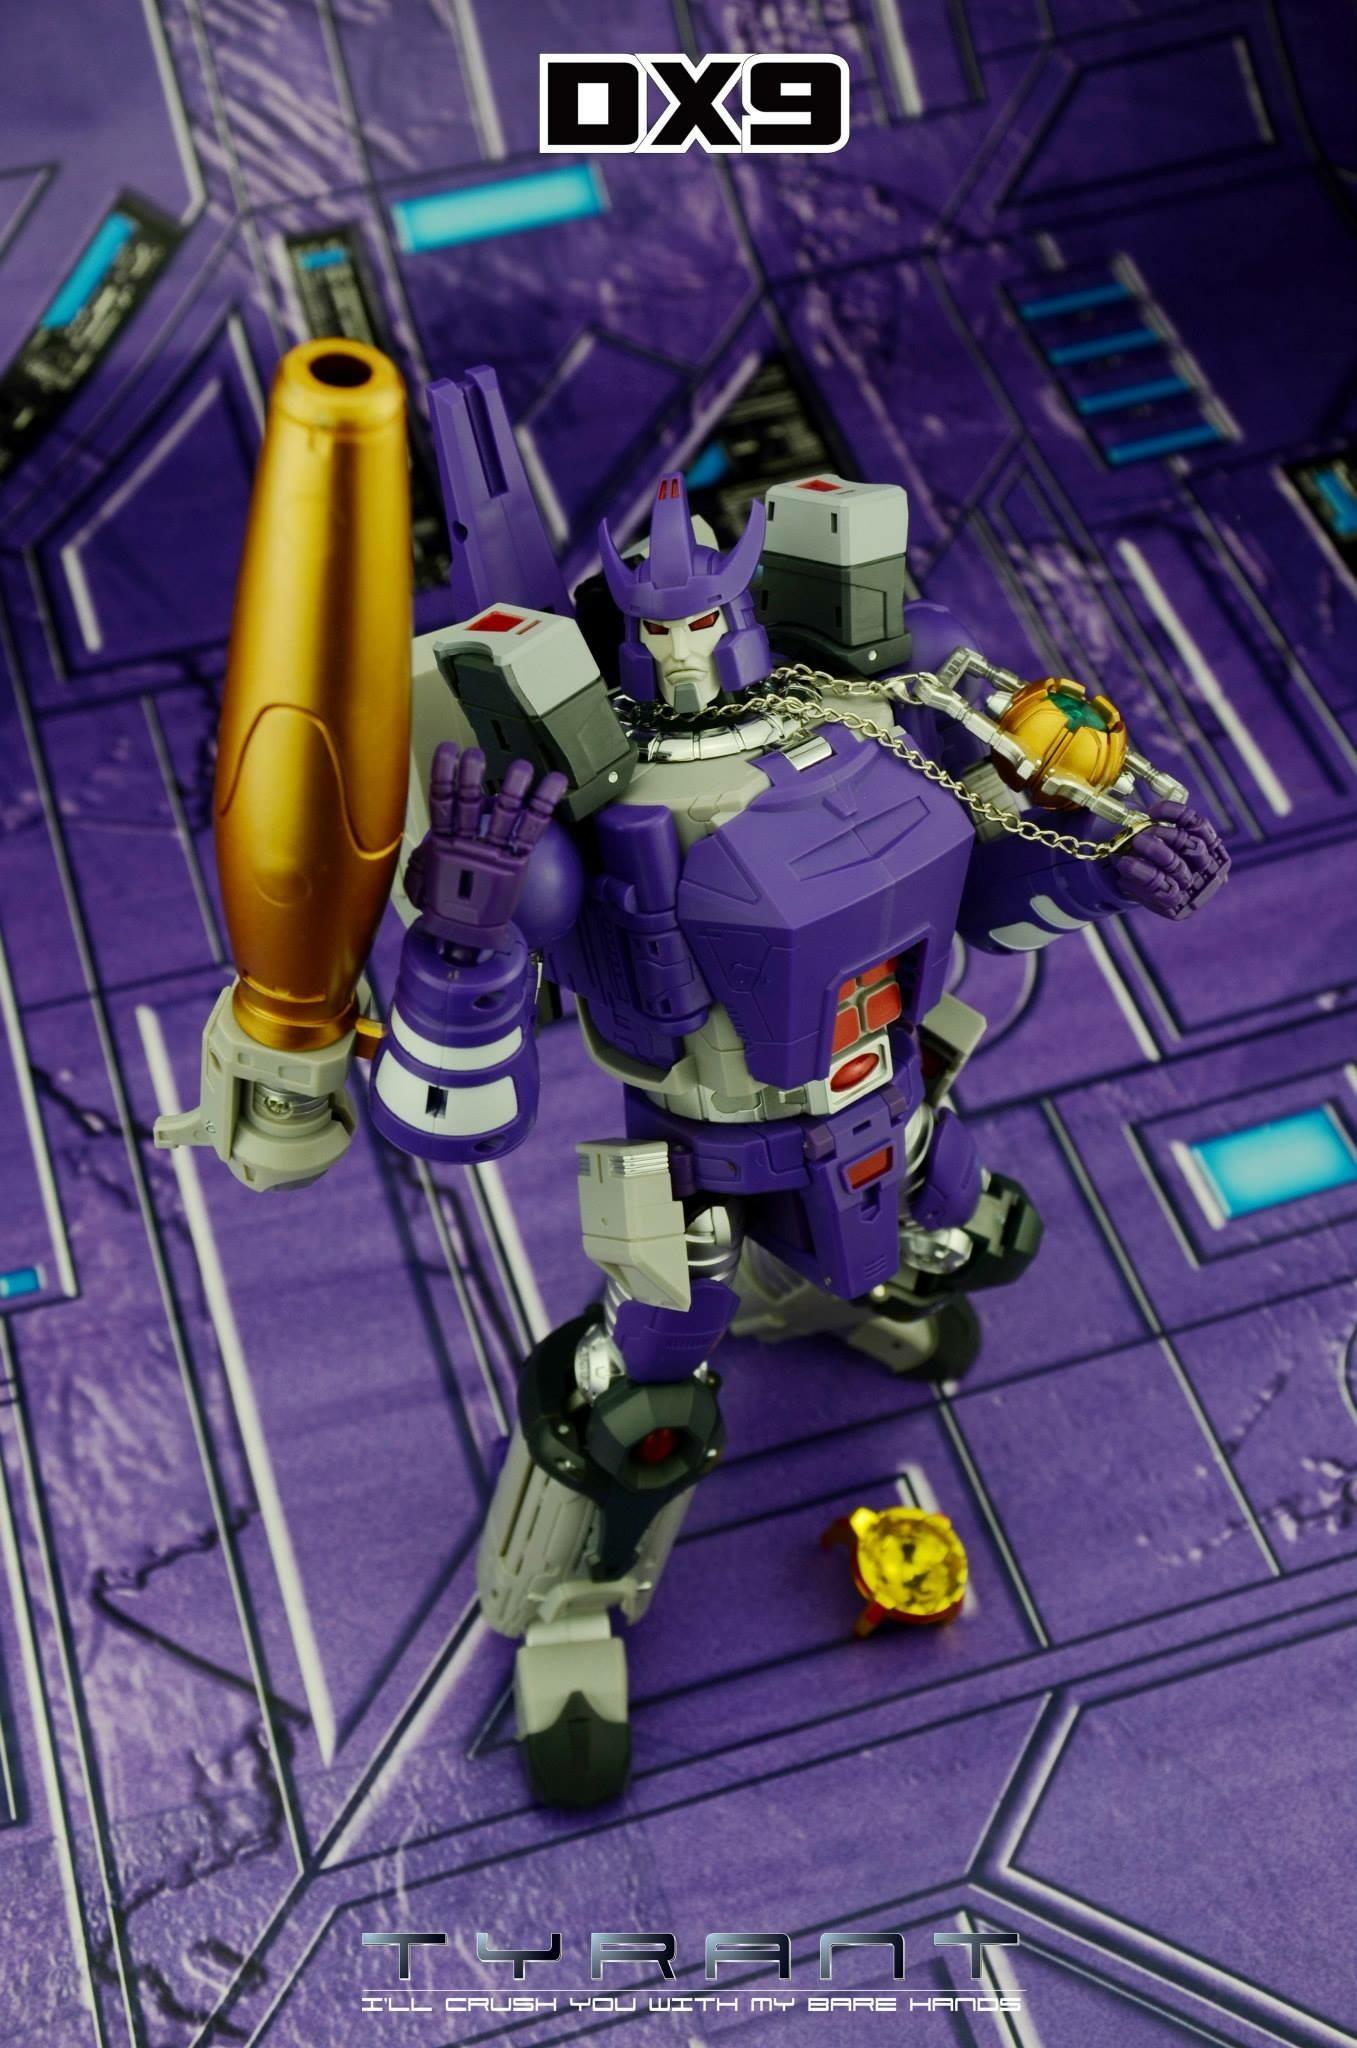 [DX9 Toys] Produit Tiers - D07 Tyrant - aka Galvatron Image21